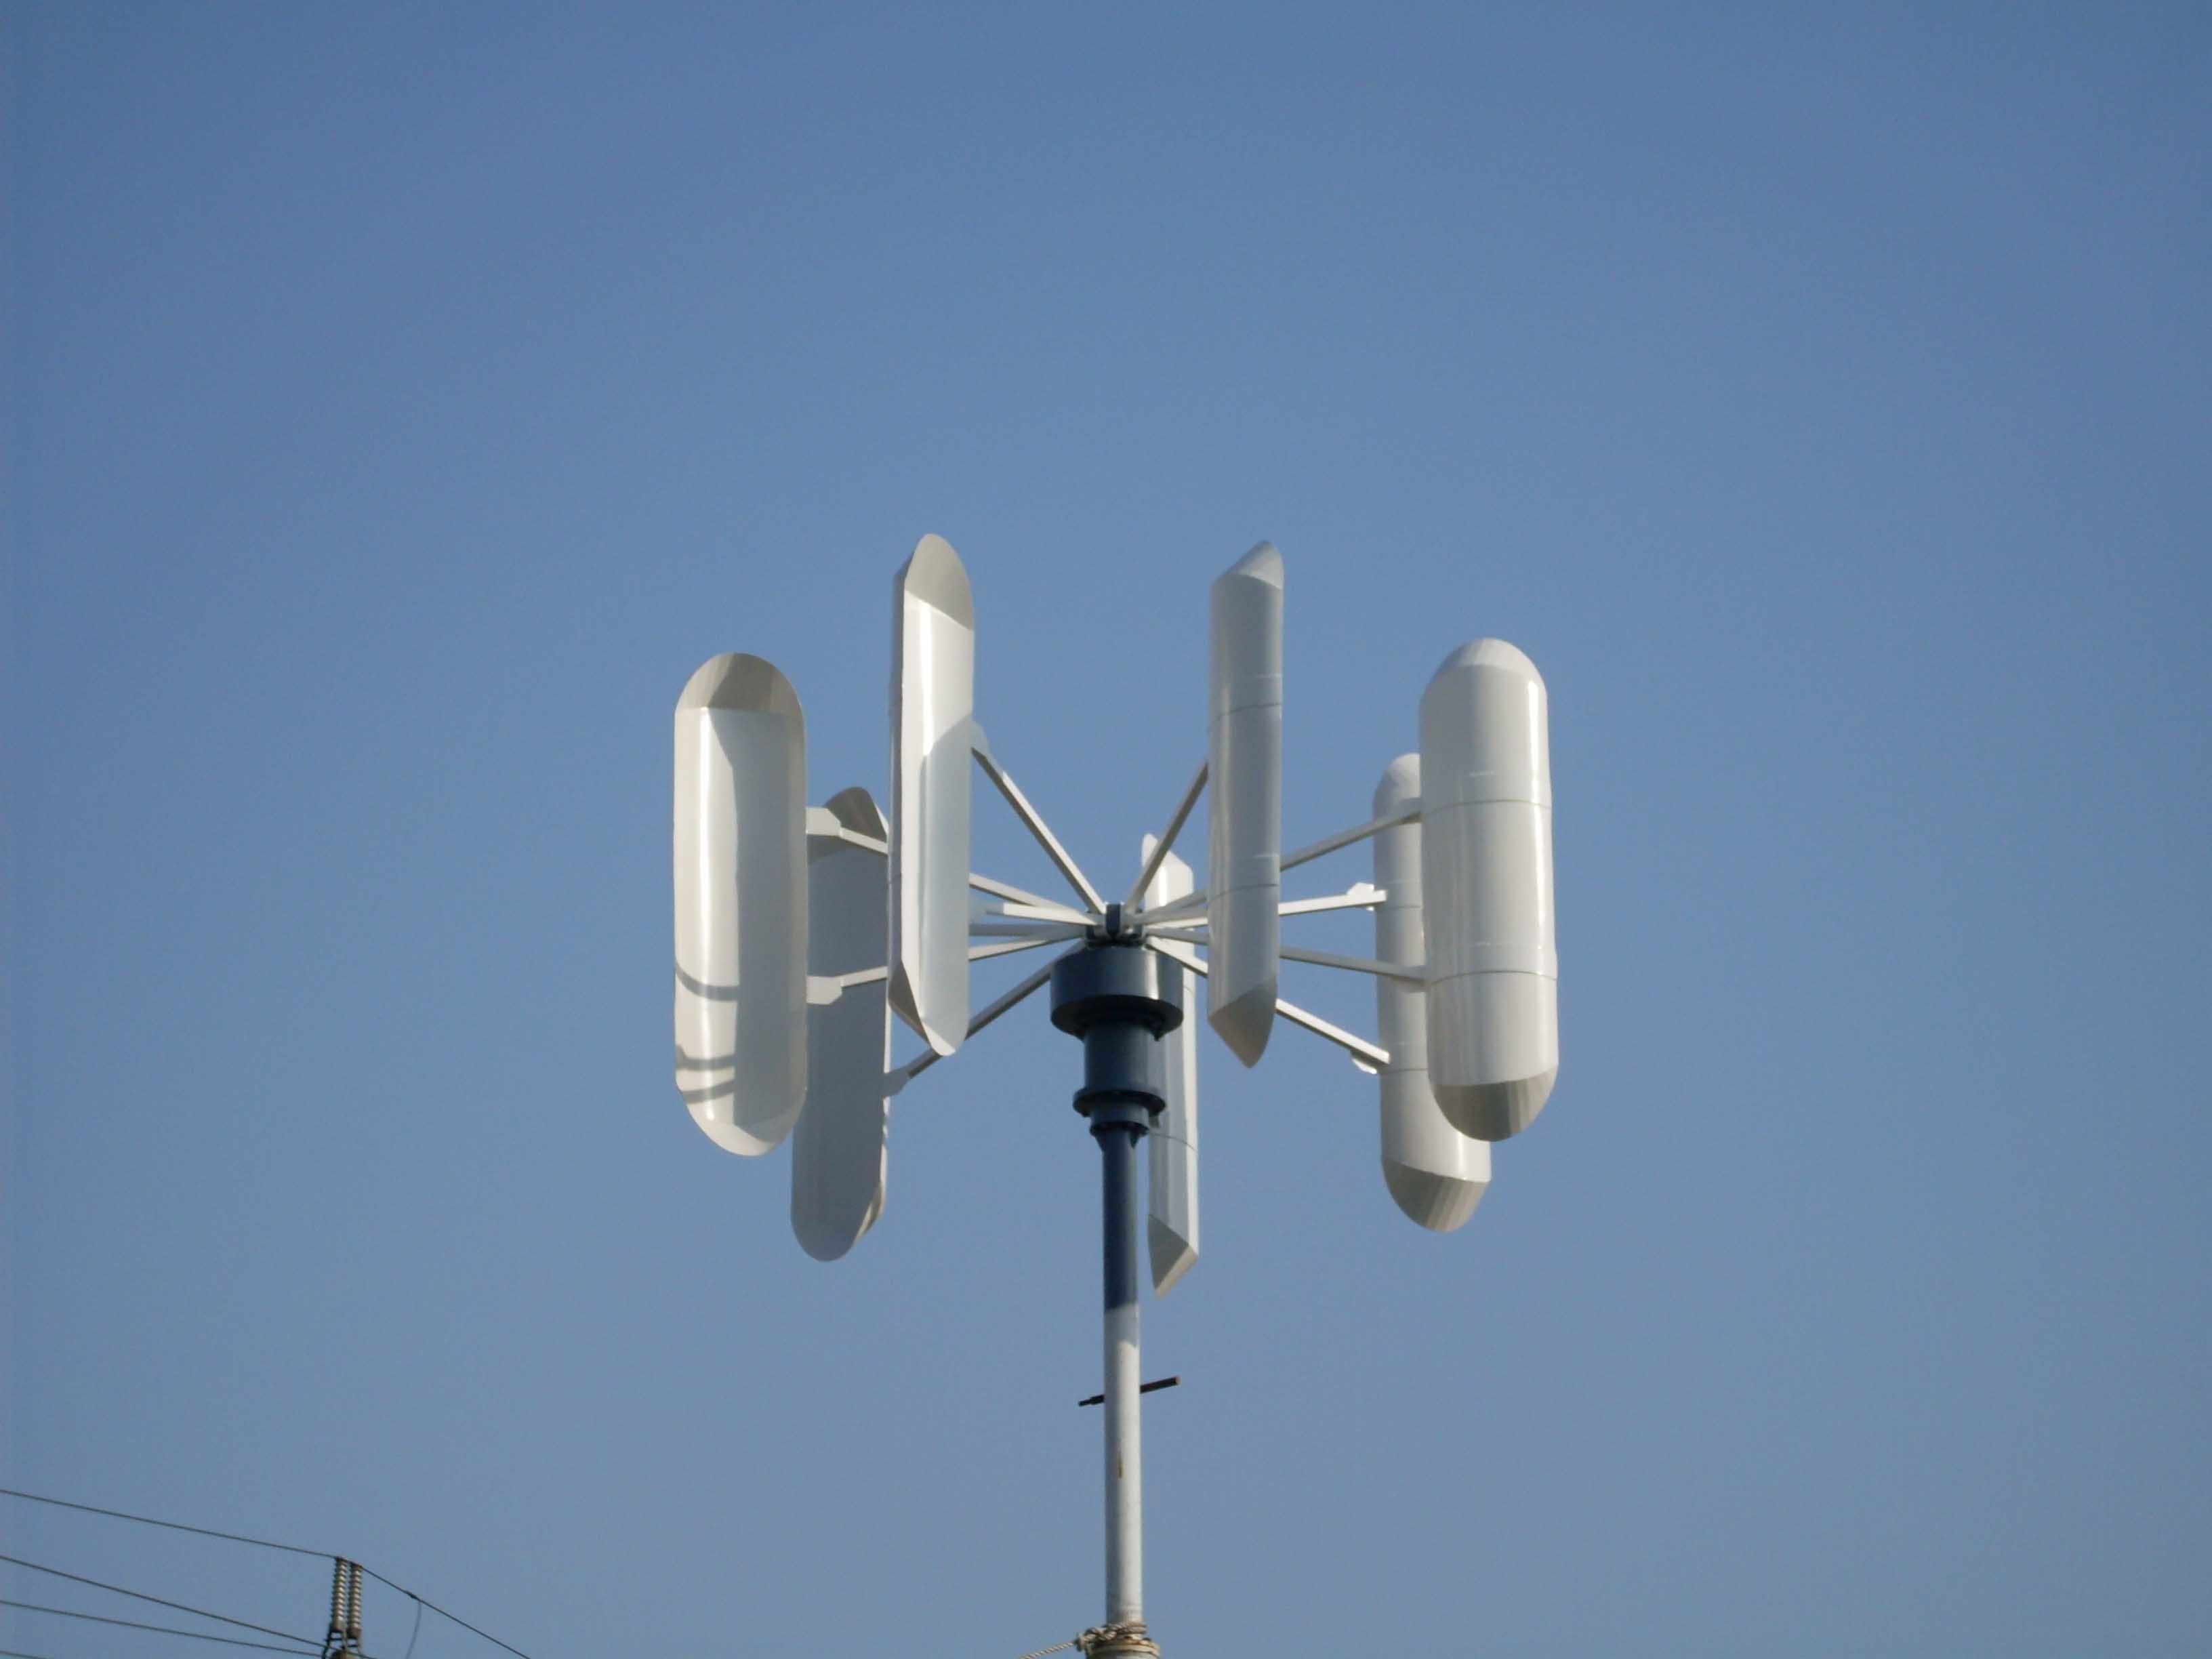 ... Power System for Street Light - China Wind Turbine Generator, Wind